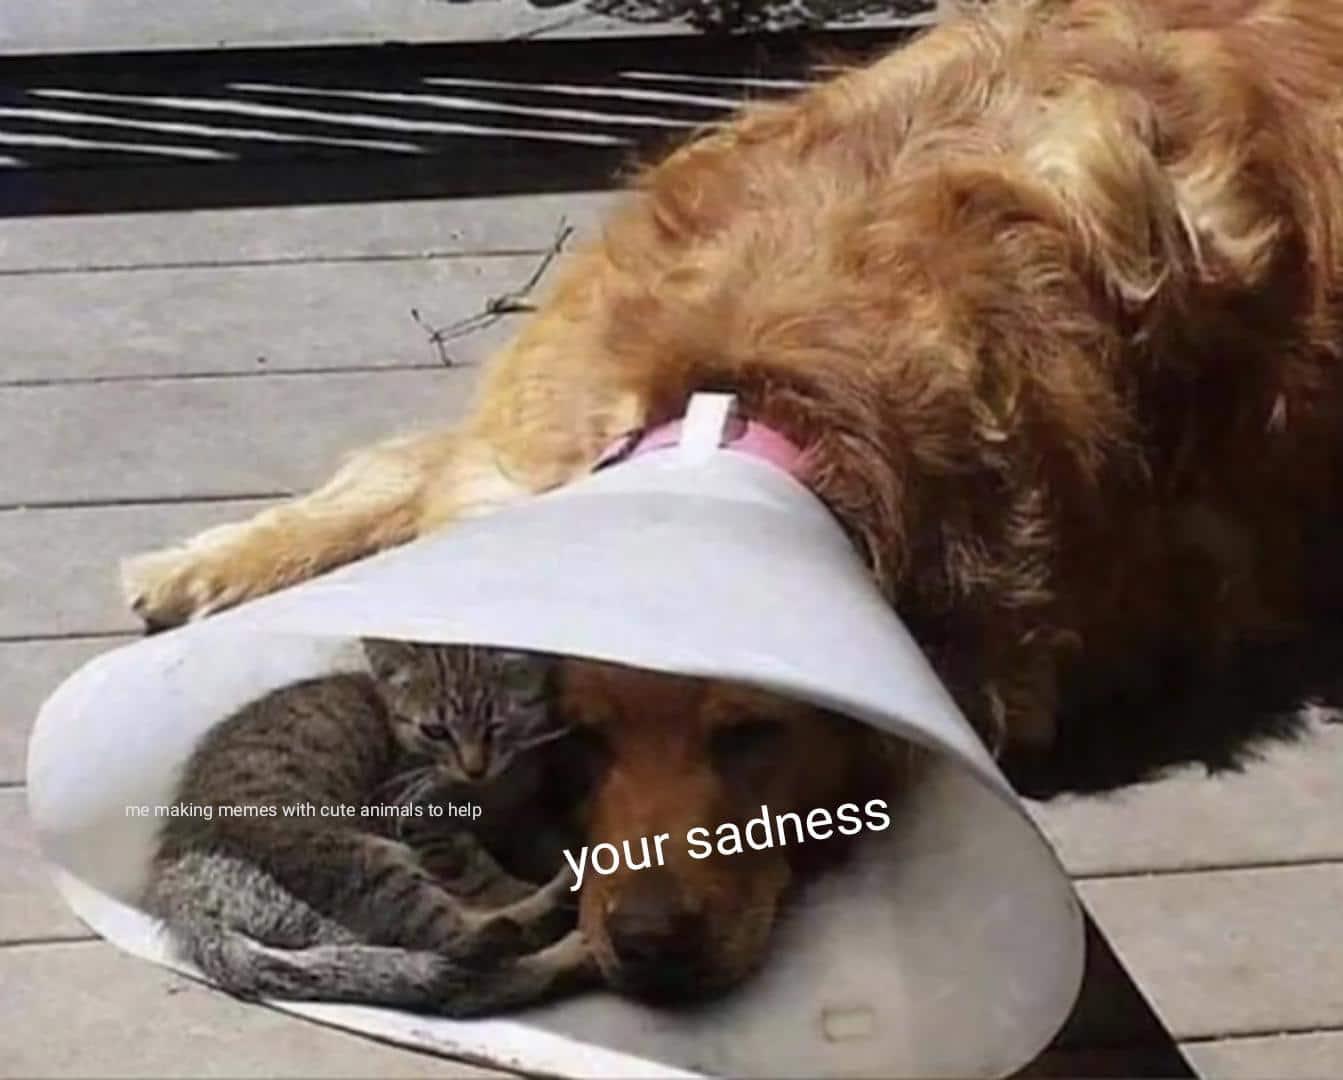 cute wholesome-memes cute text: me